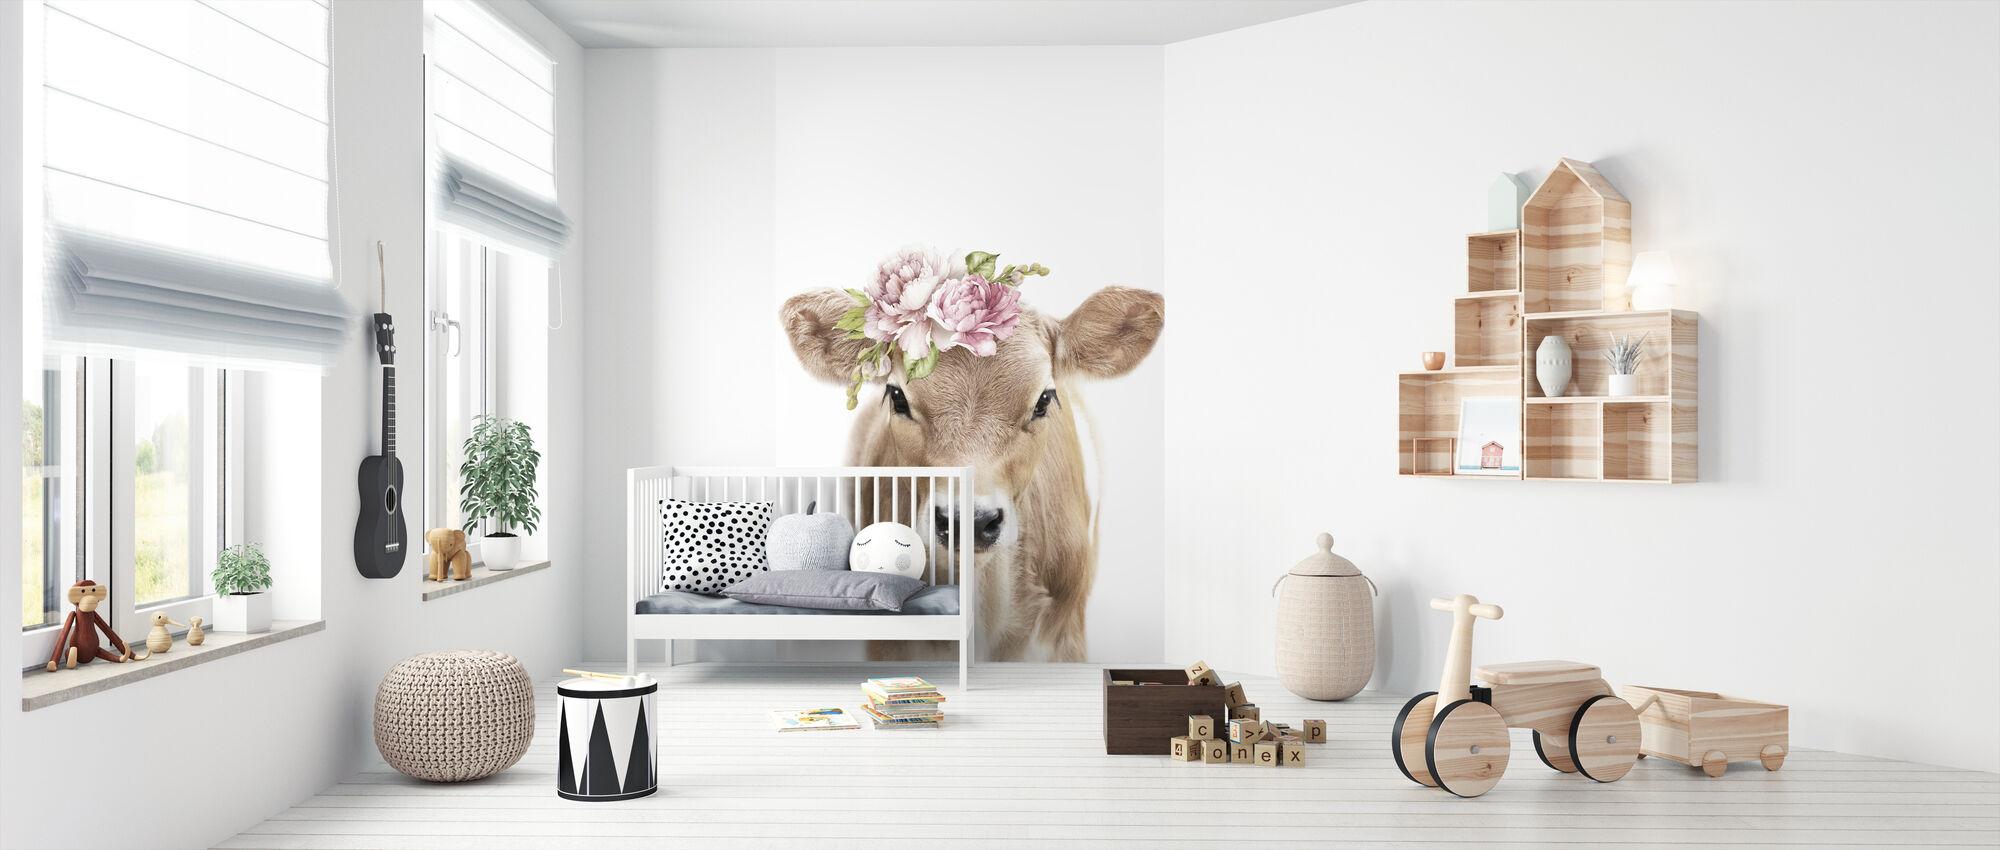 Floral Calf - Wallpaper - Nursery